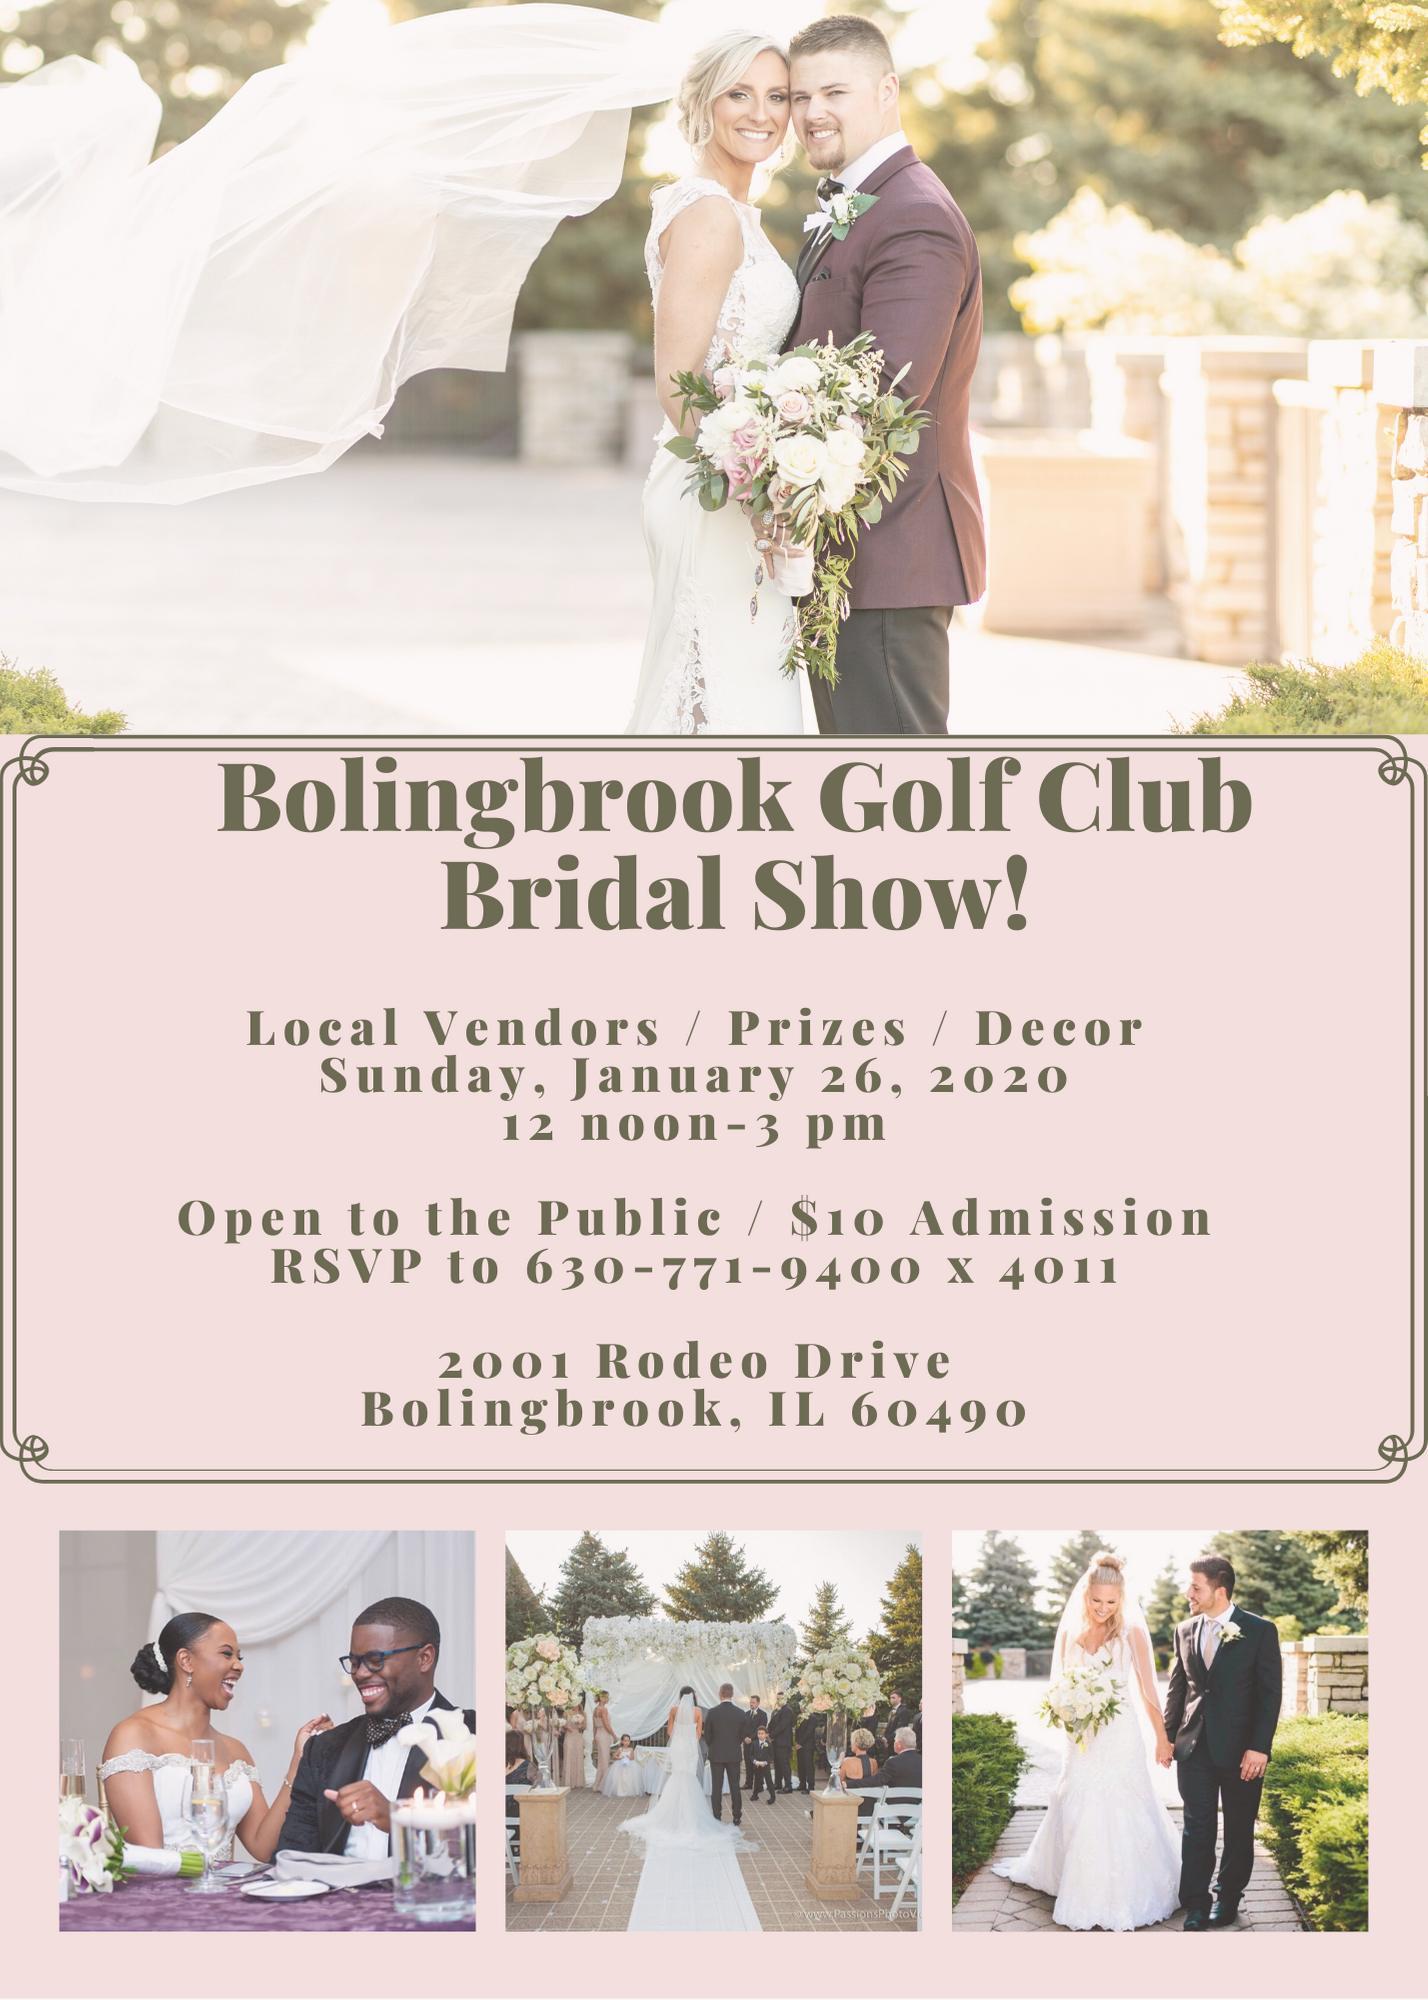 Bolingbrook Golf Club Bridal Show - january 2020